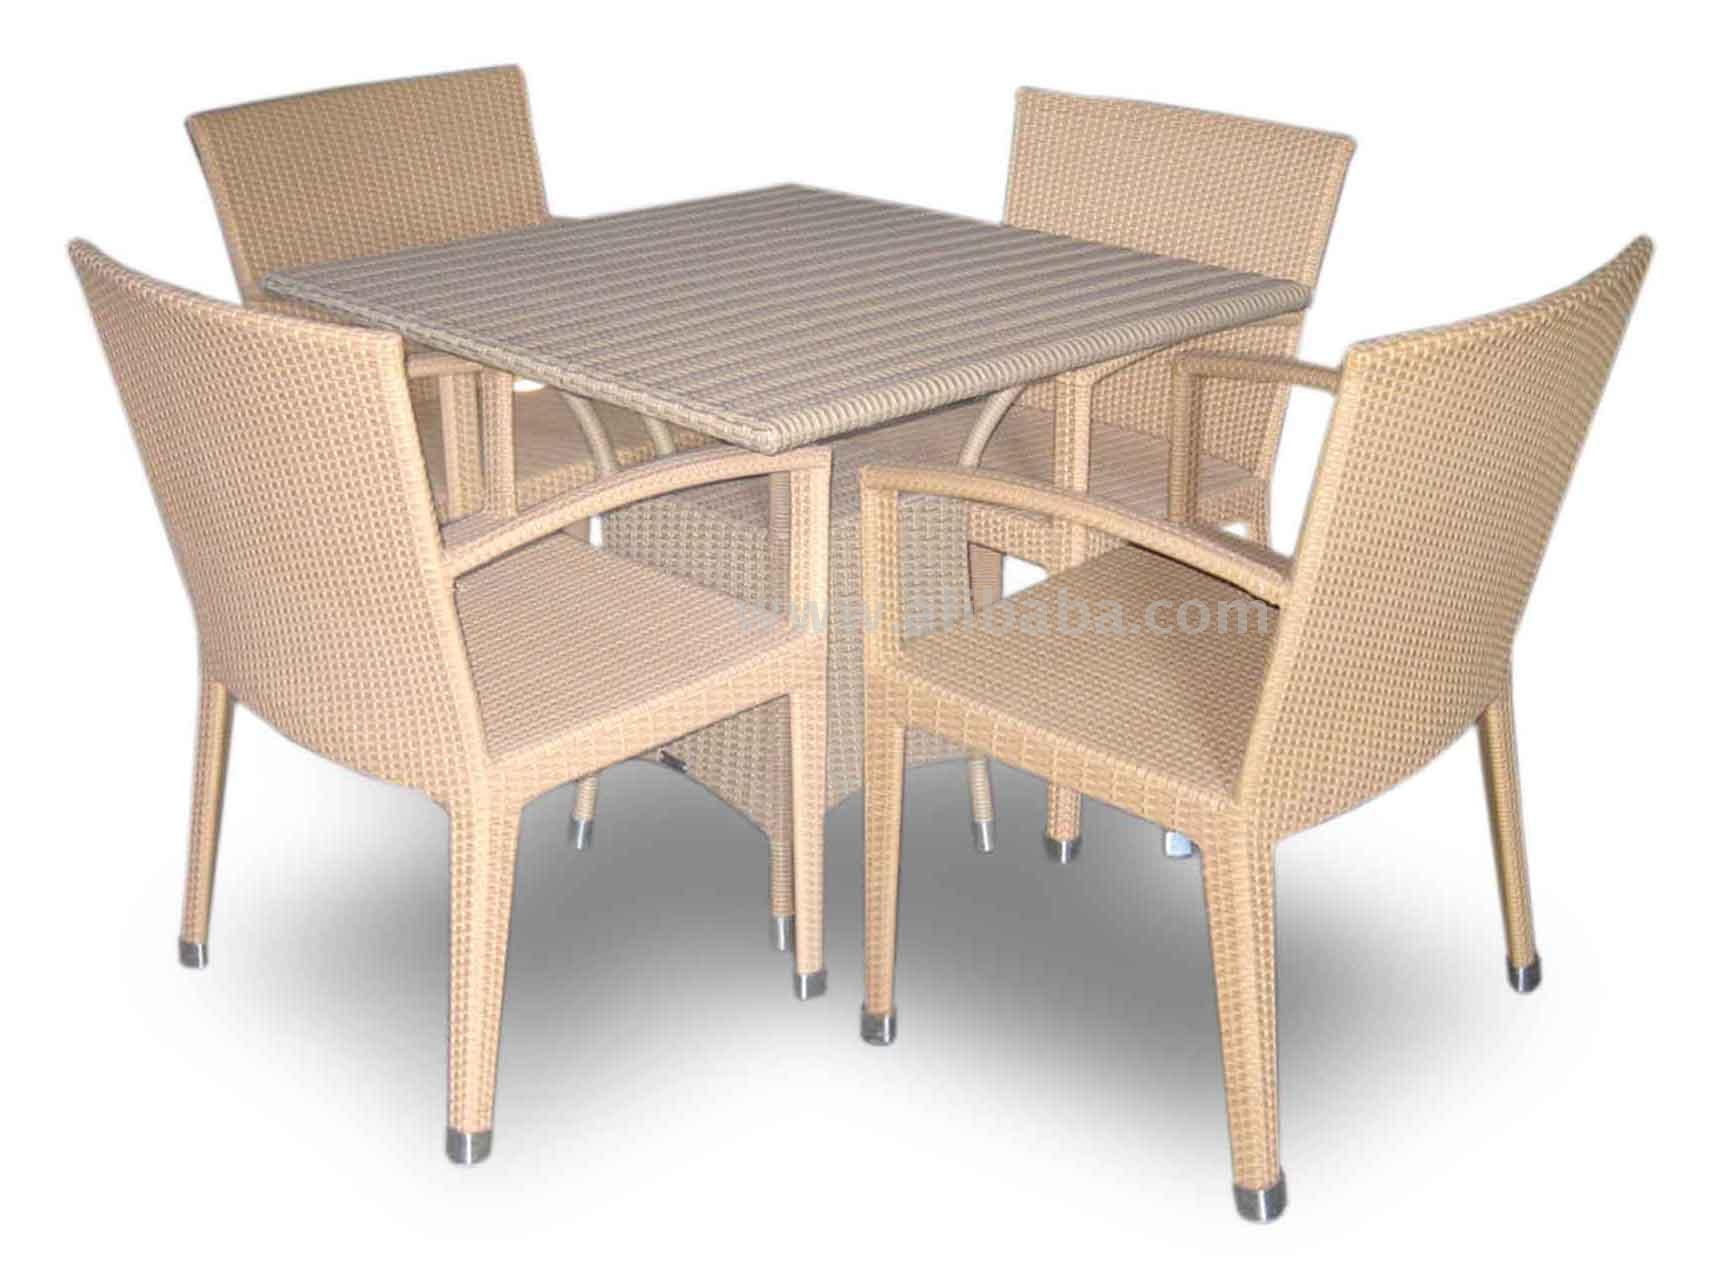 Furniture and plastic 82